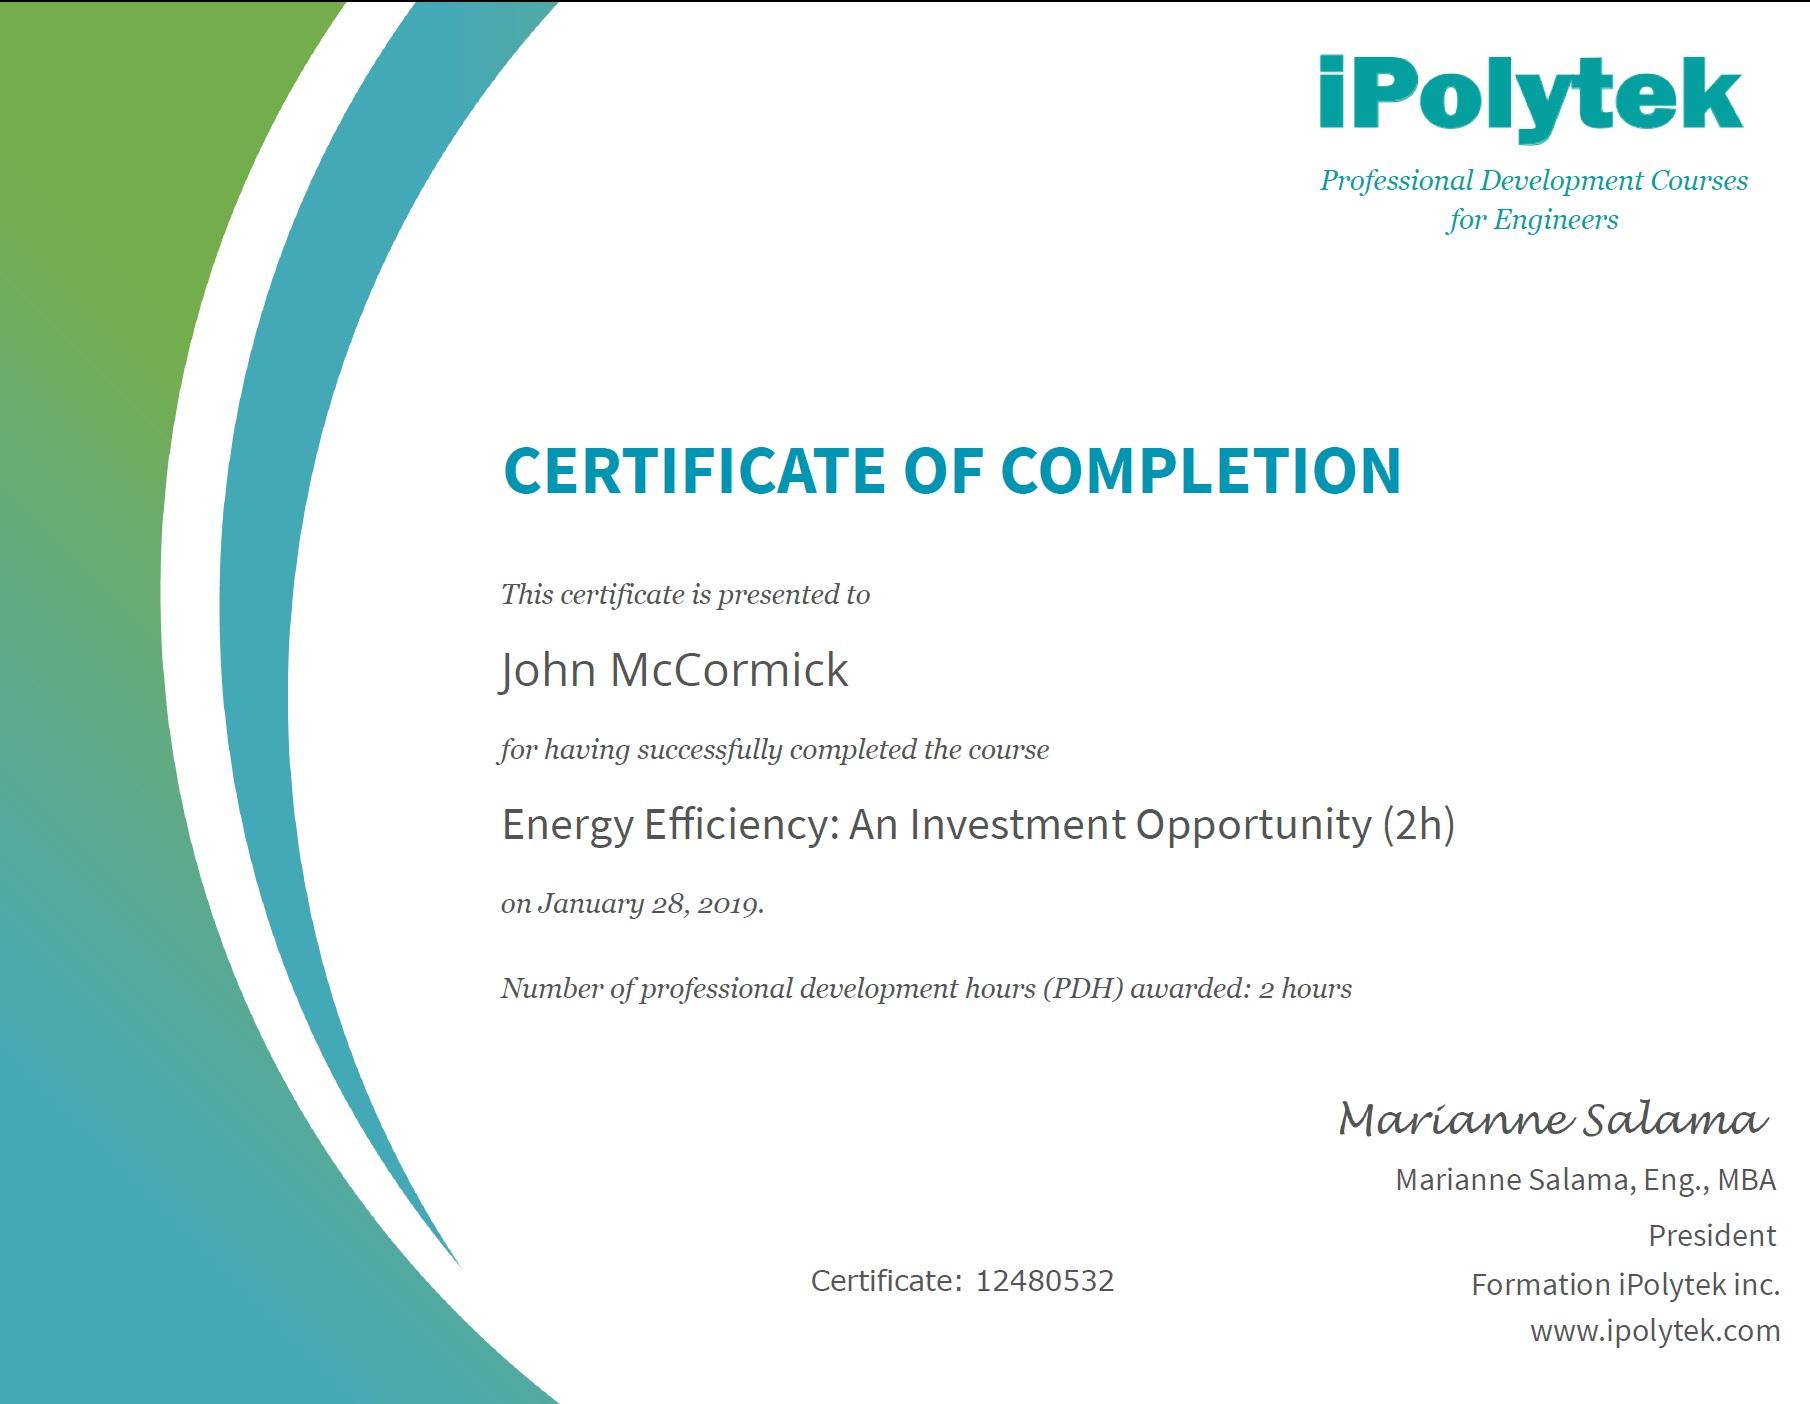 Get your Professional Development Certificate